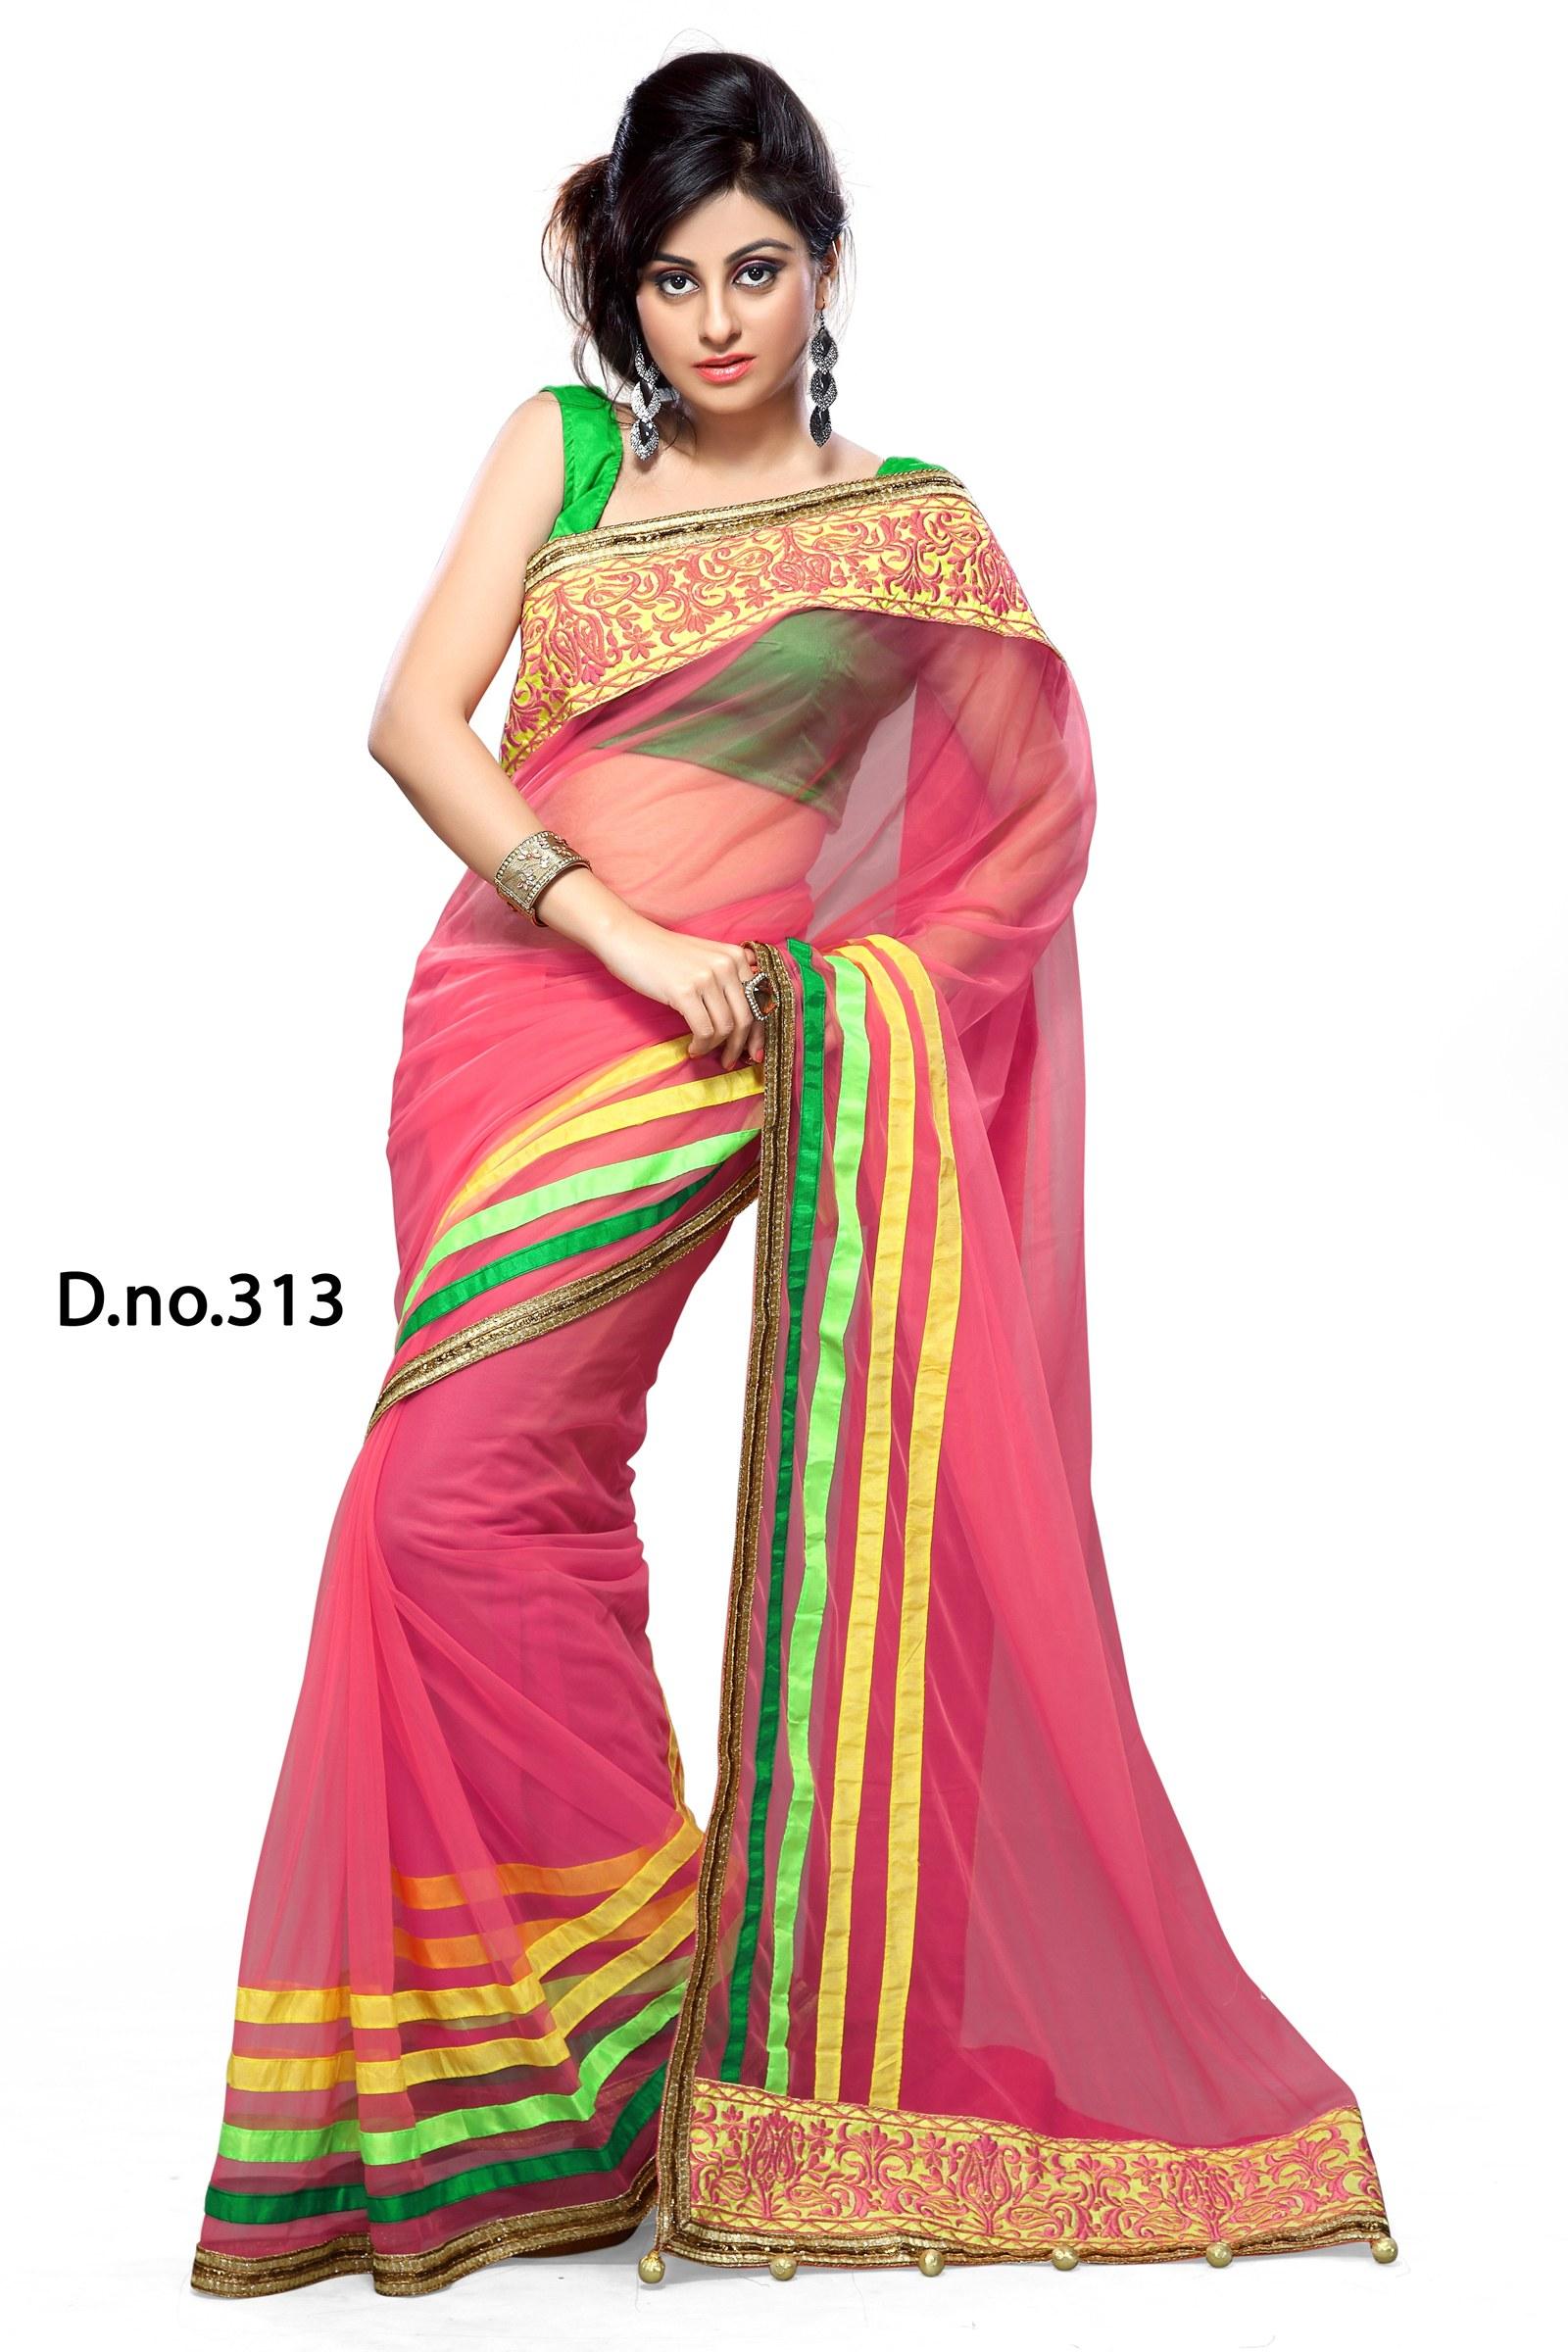 Saree World: Bollywood Replica Sonali Bendre Pink Saree Sari-Online